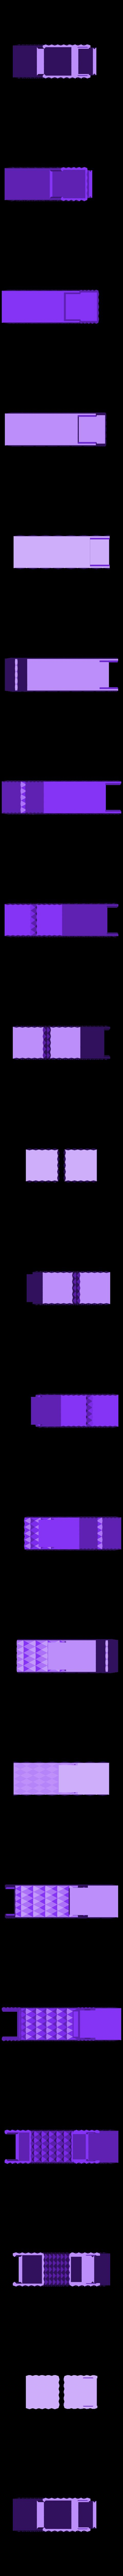 Pencil Box.stl Download free STL file Pencil Box • 3D printing template, 3DBuilder